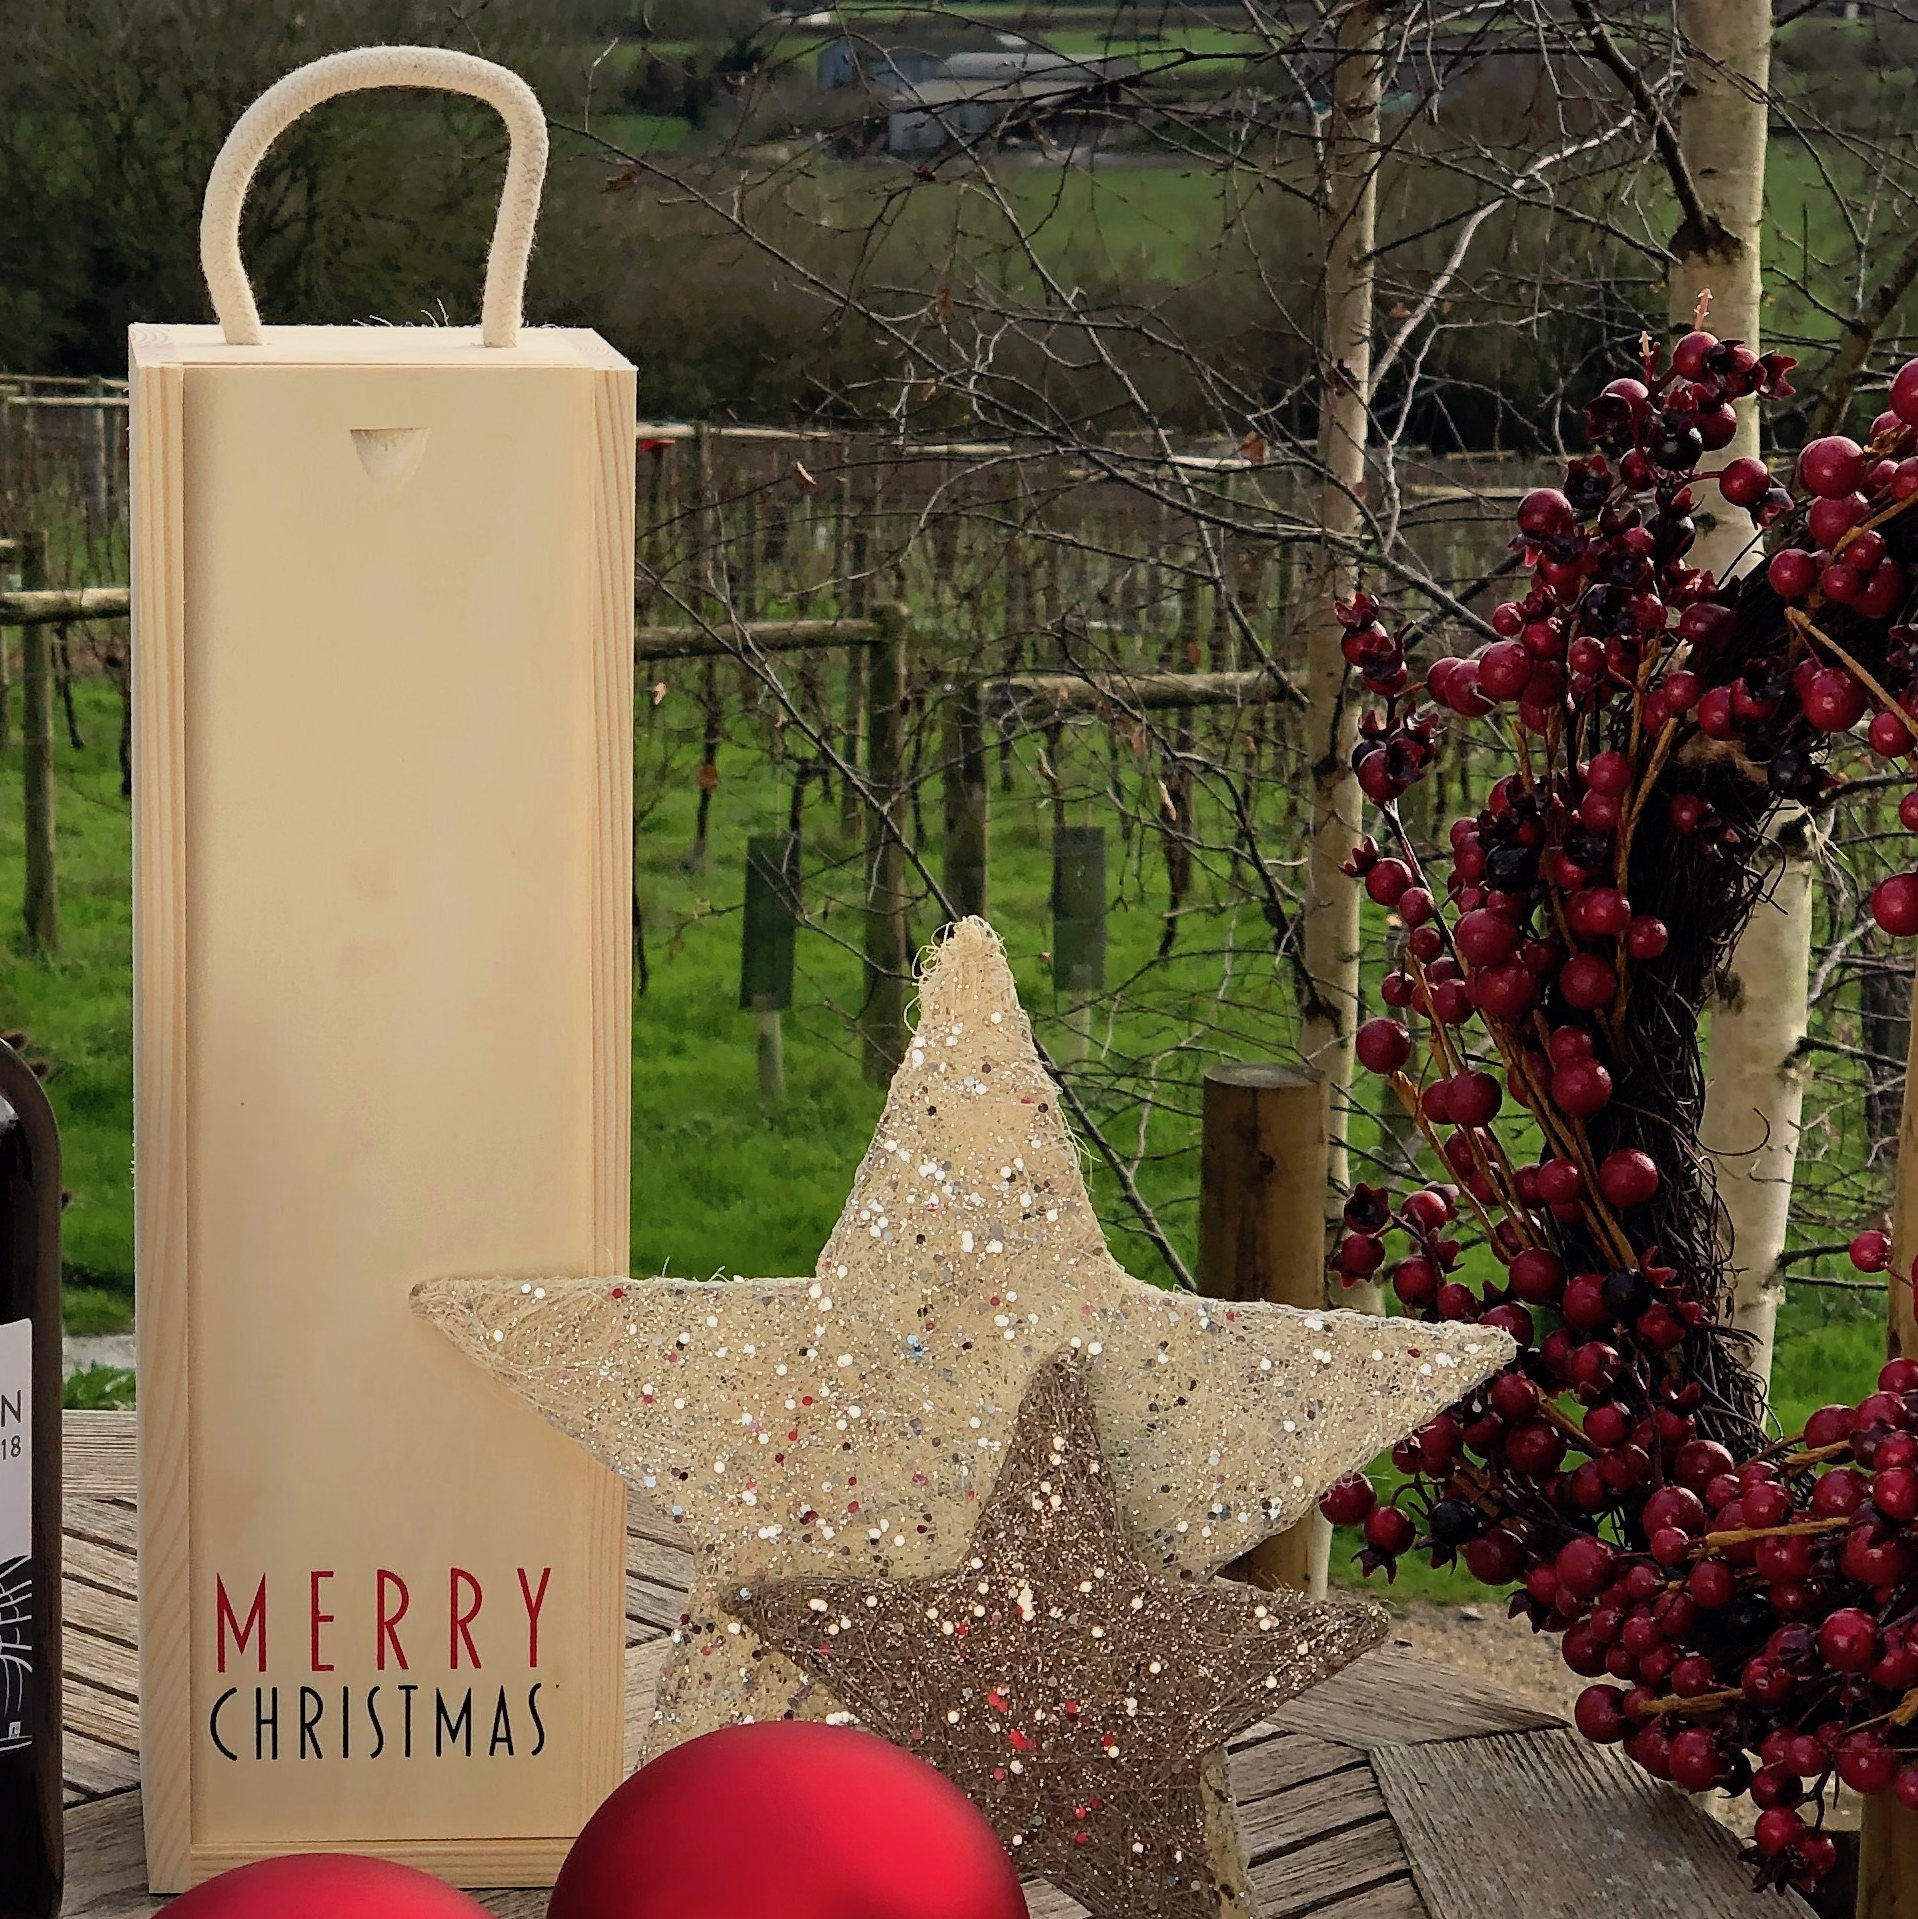 Single bottle Christmas wooden presentation box